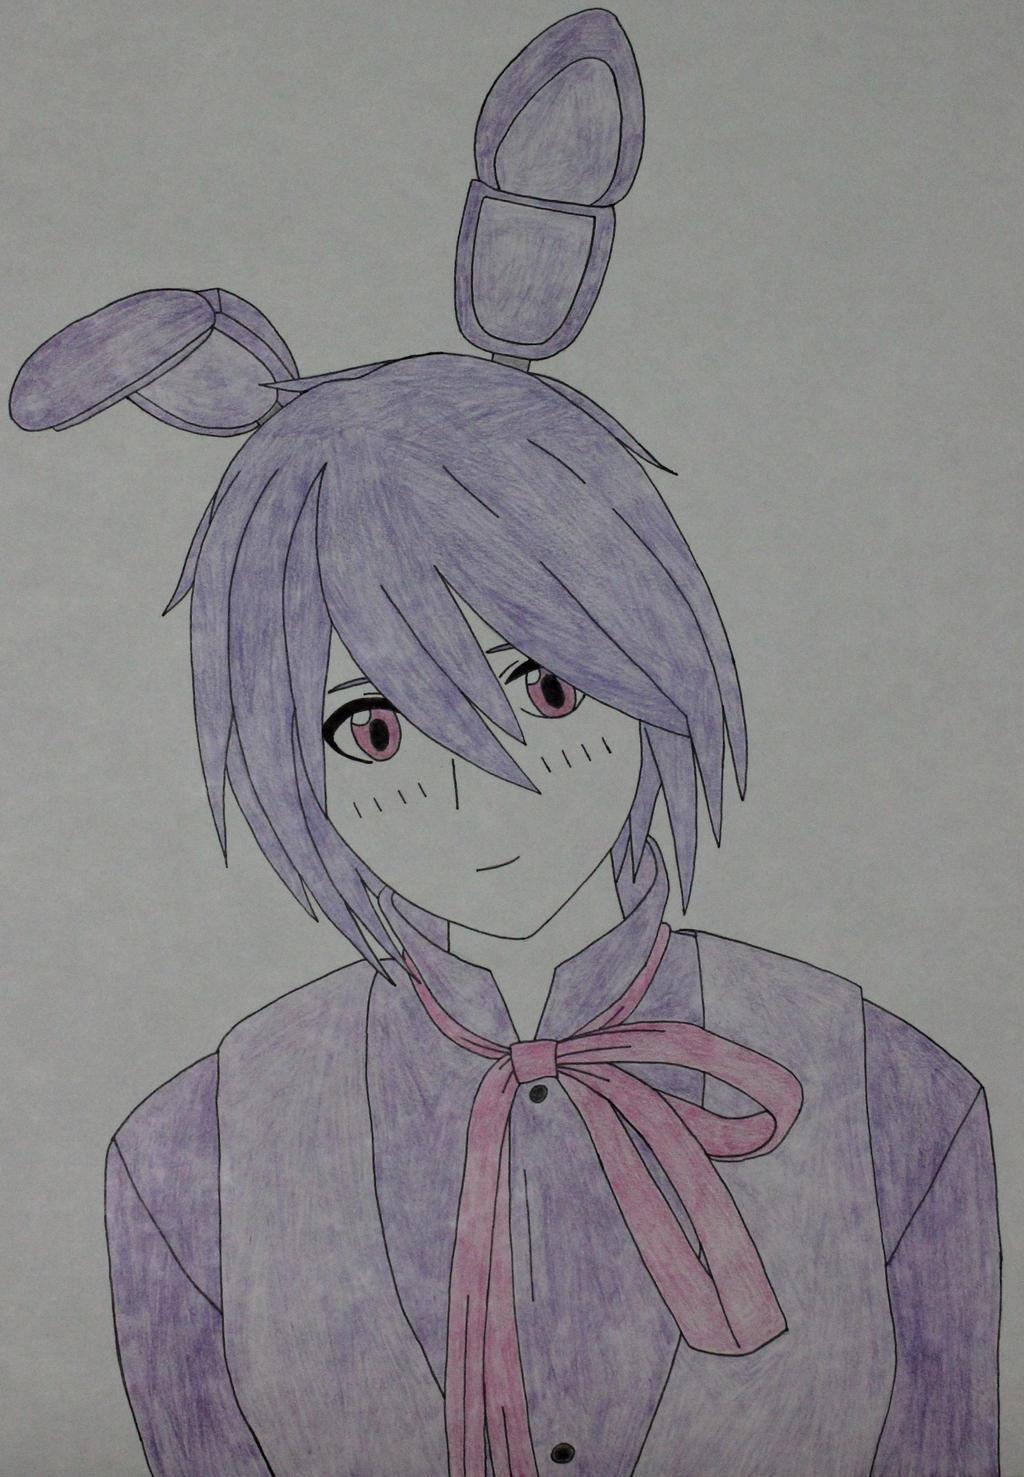 Human bonnie drawing by sweetgirl333 on deviantart